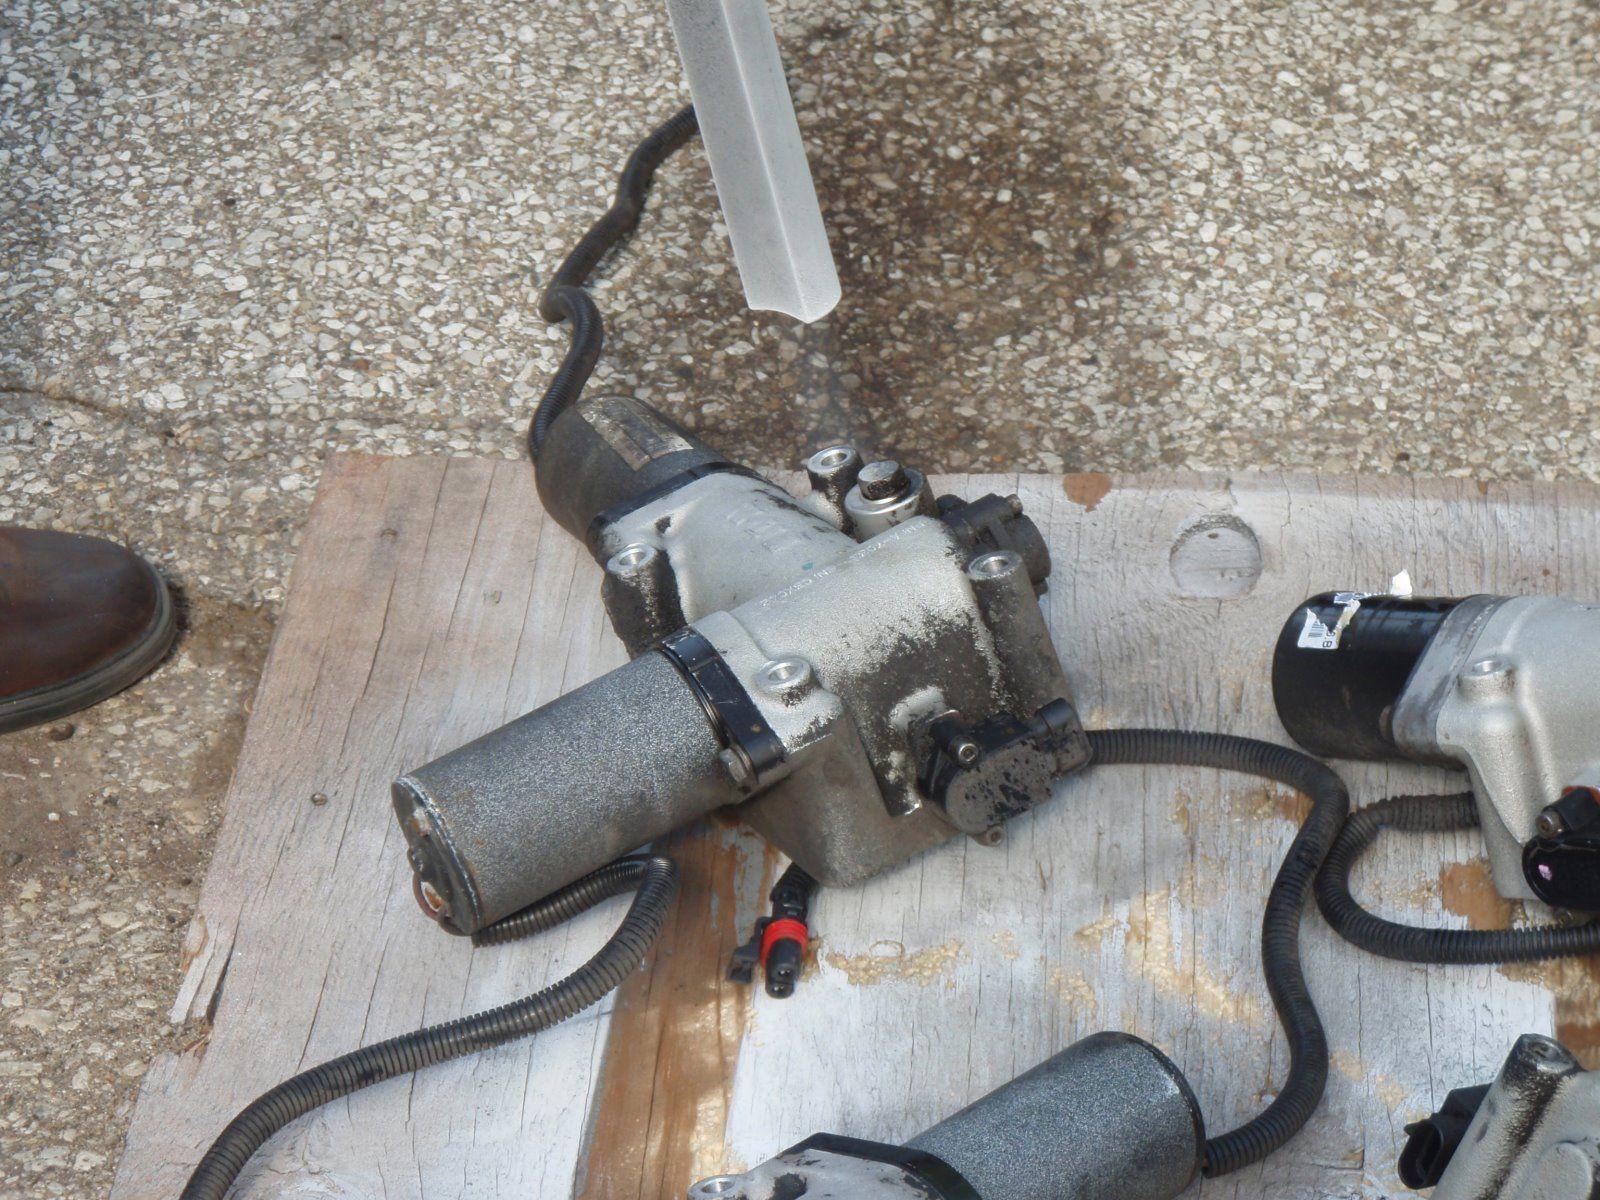 Dry Ice Blasting - Electric Motor Equipment